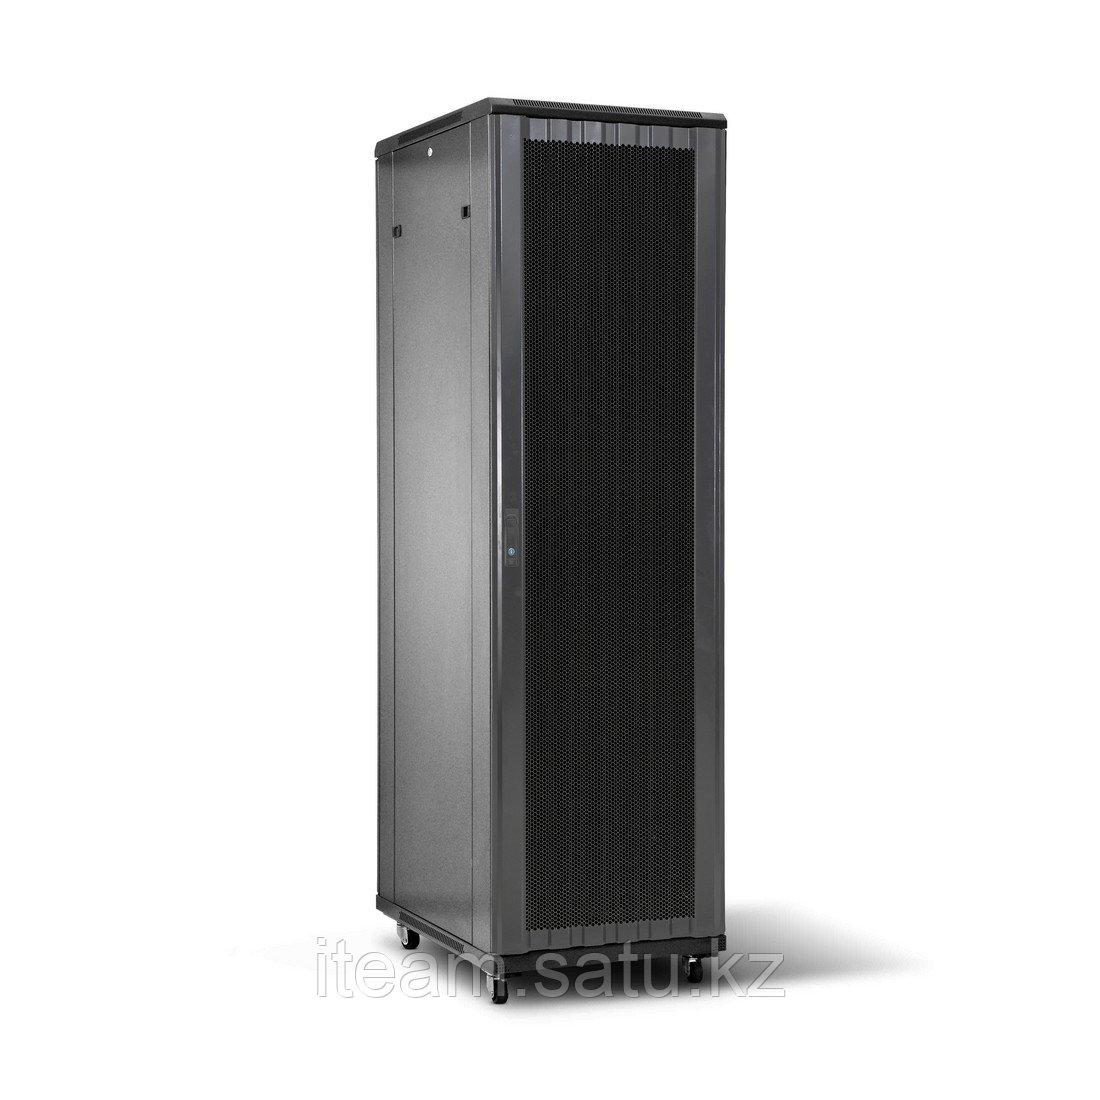 Шкаф серверный SHIP 601S.6842.54.100 42U, 600*800*2000 мм